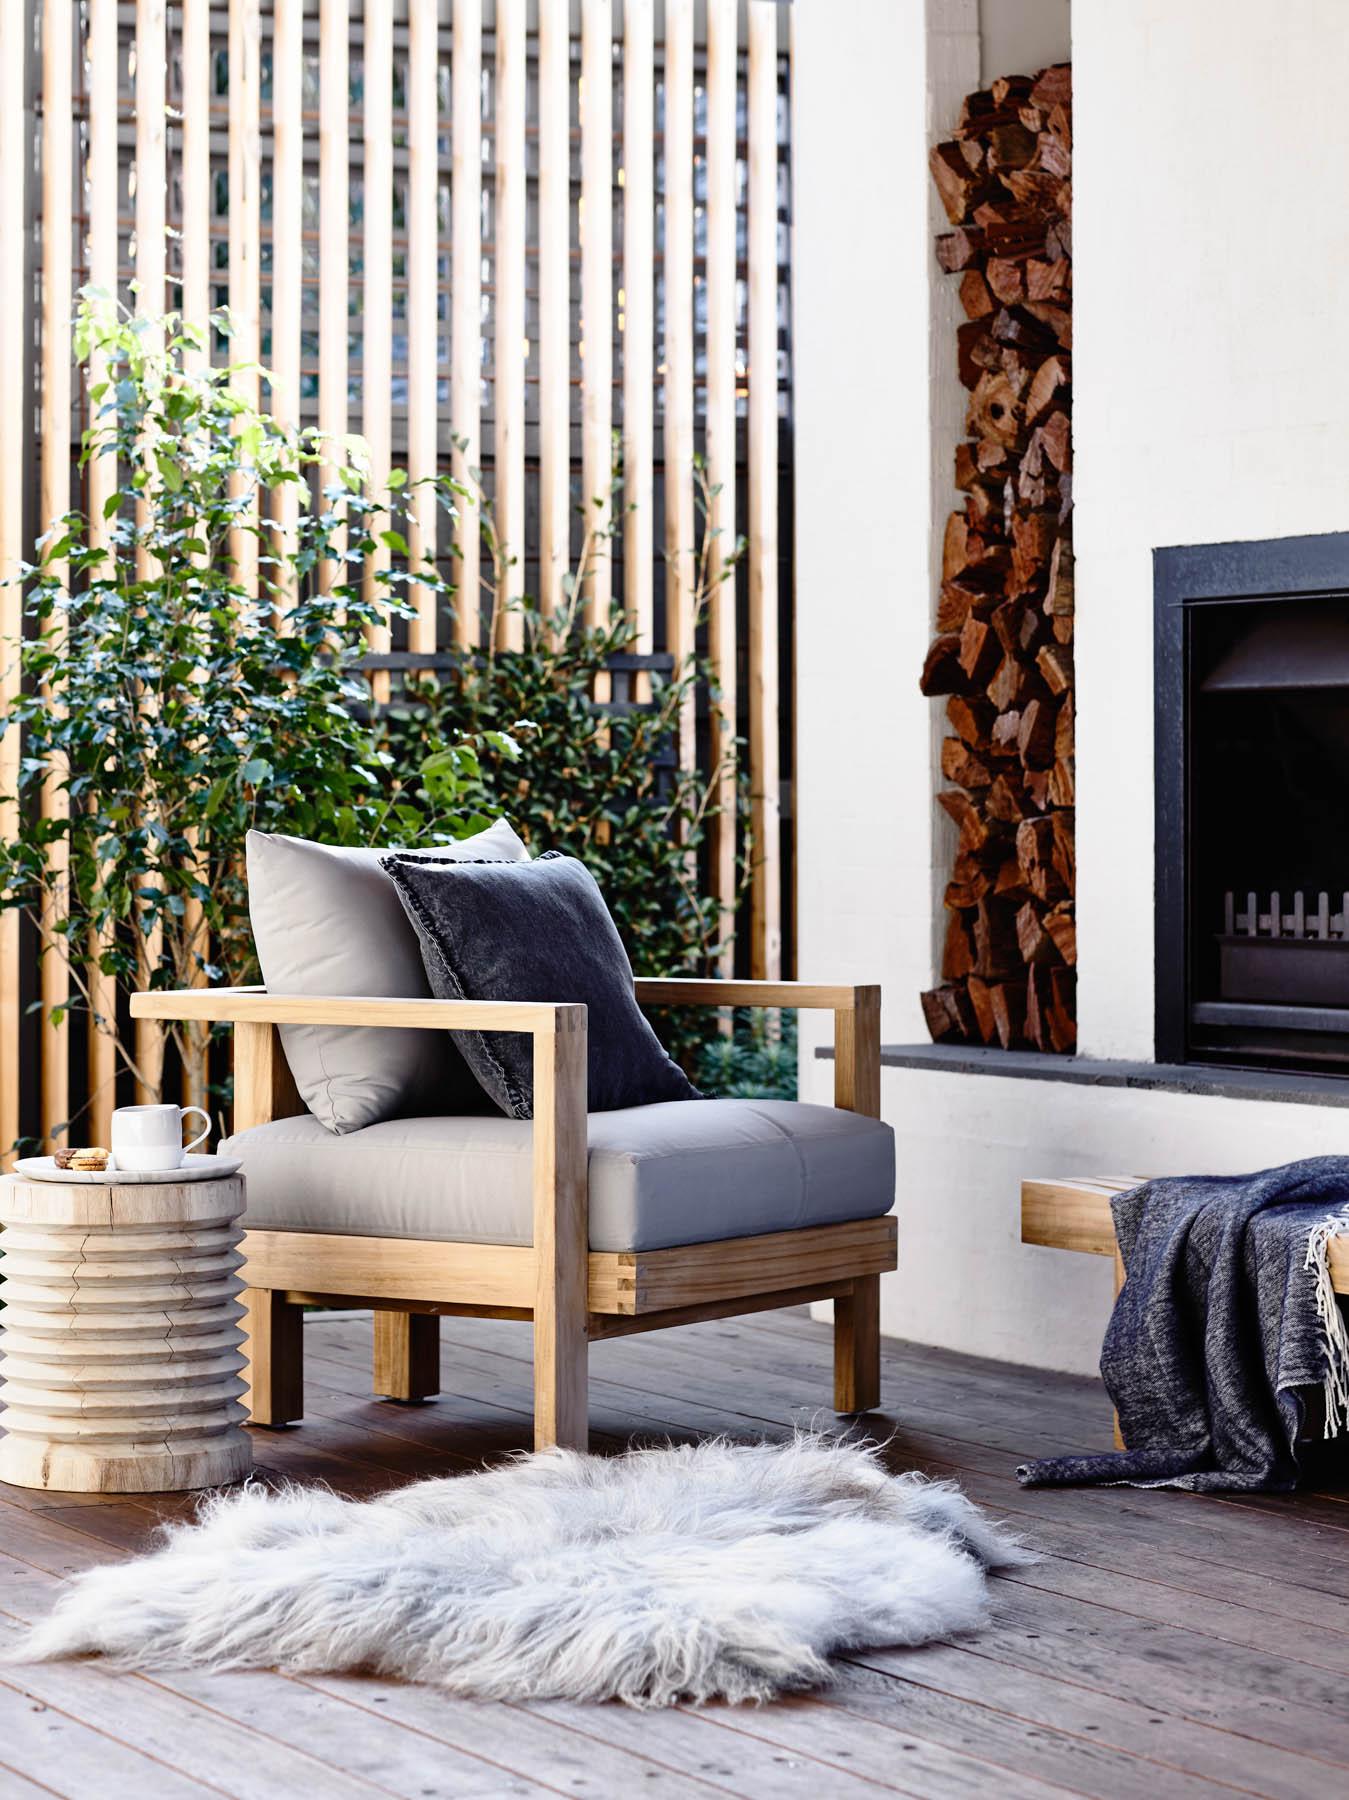 Furniture Gallery Sofas sonoma-one-seater-sofa-01